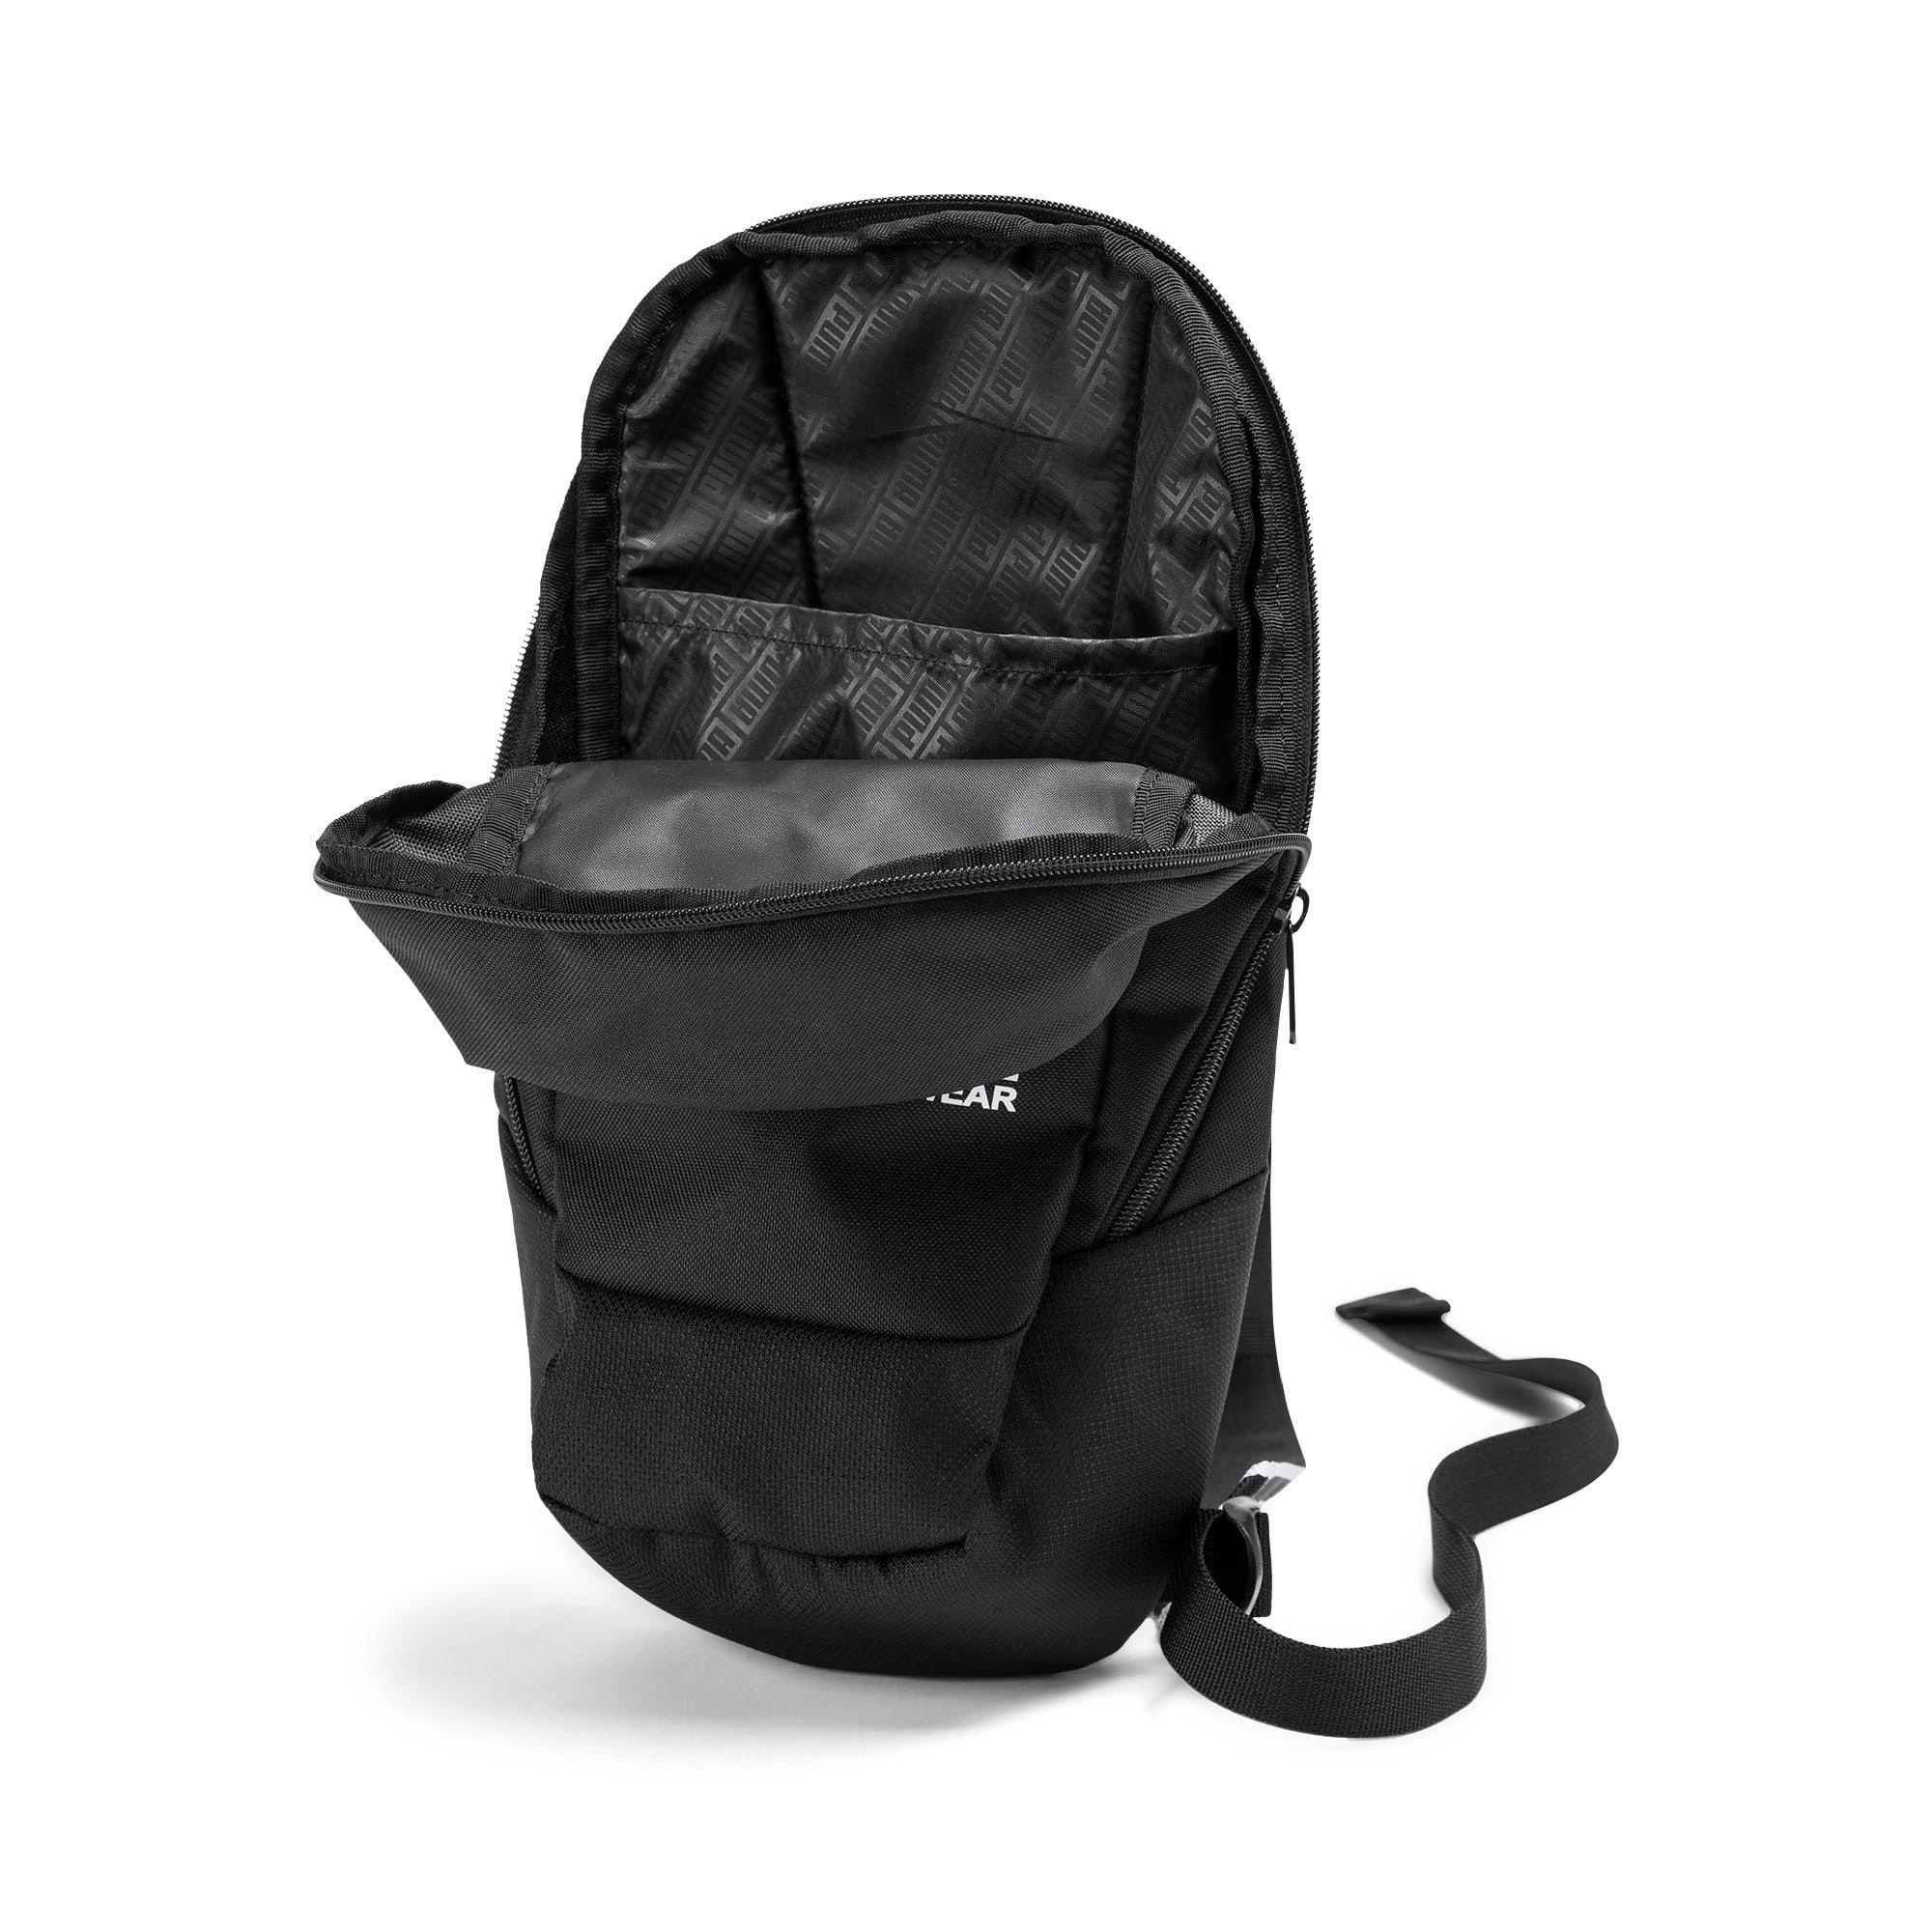 Thumbnail 3 of Sole X-body Bag, Puma Black, medium